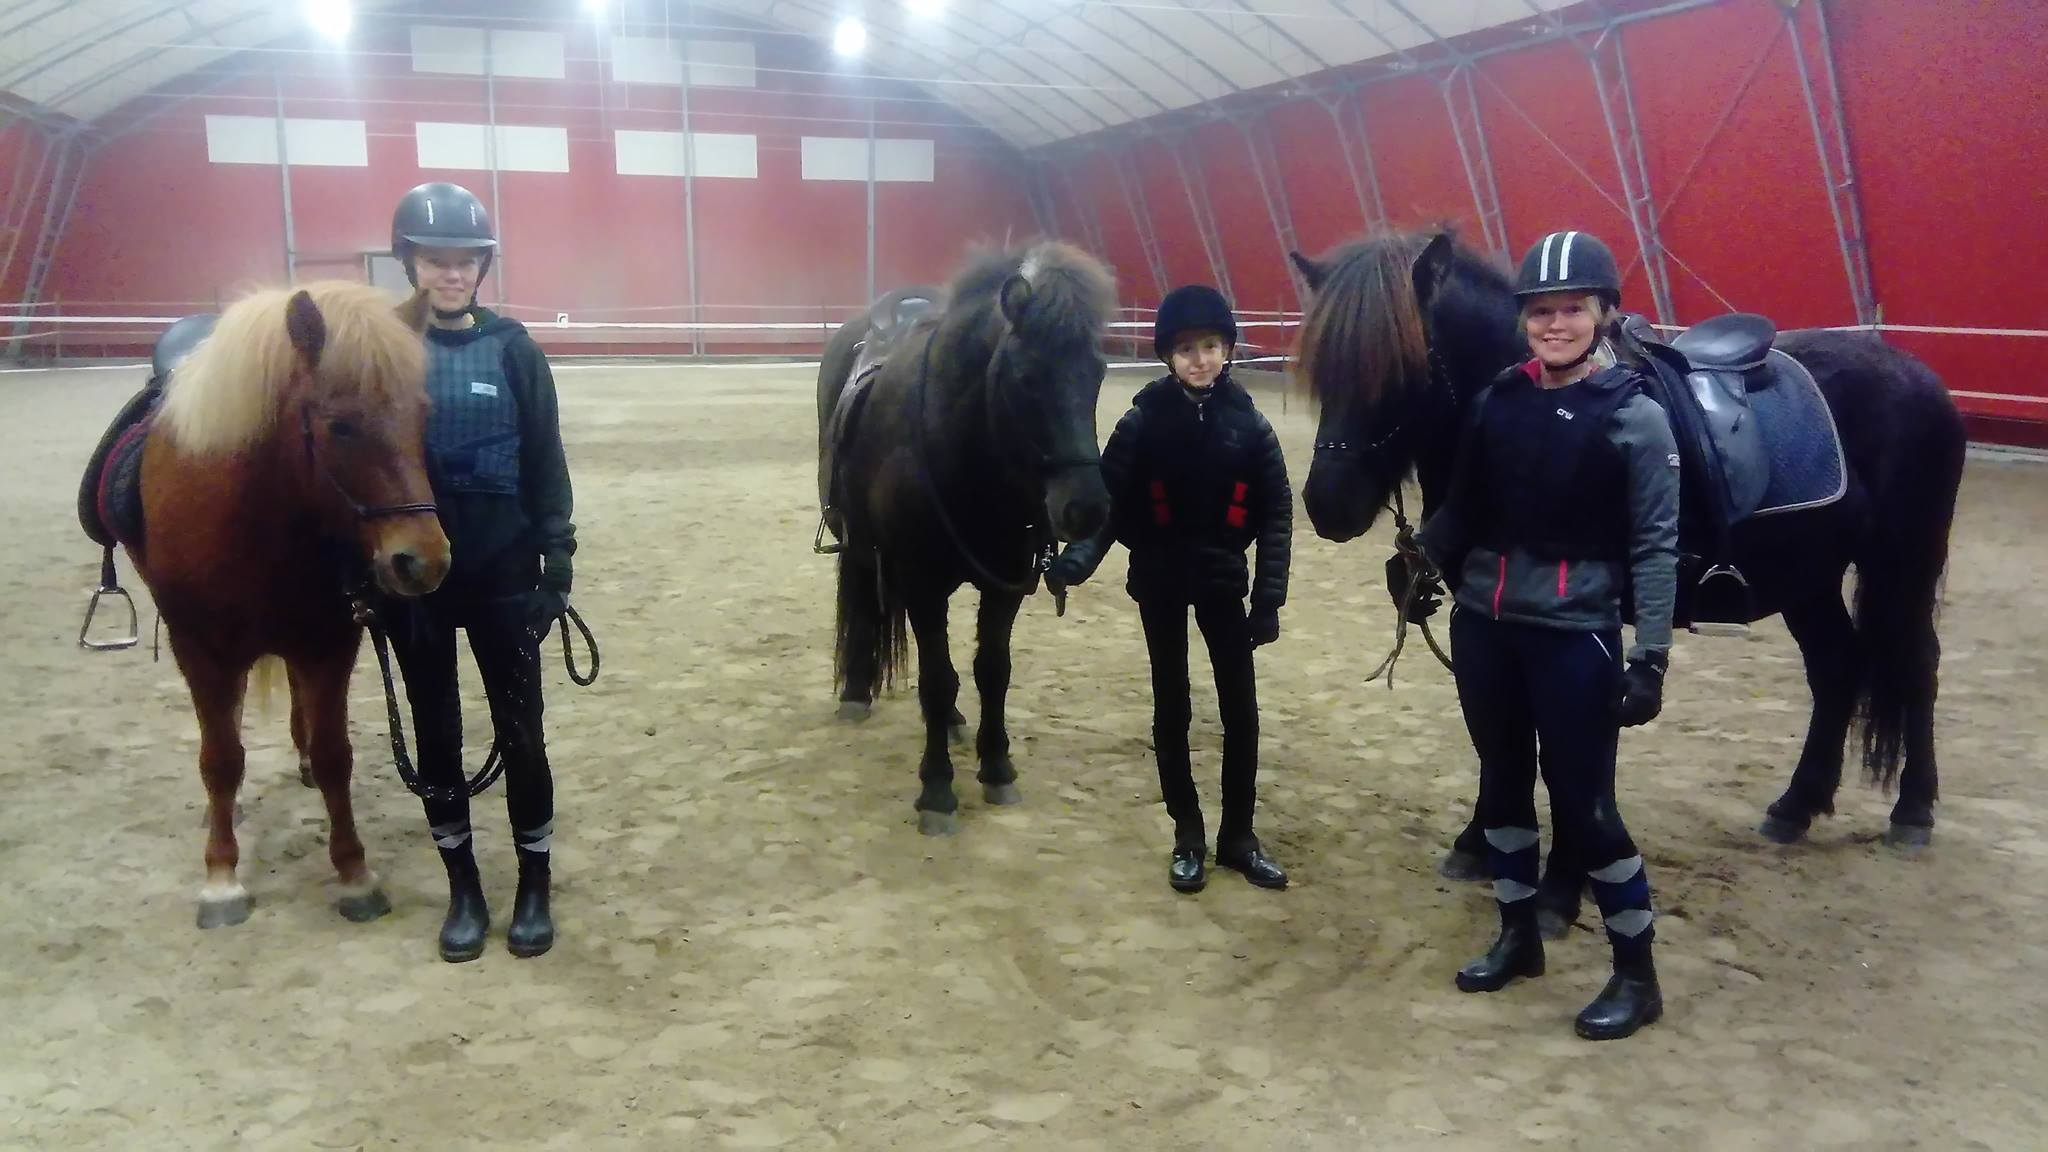 riding school riding school-sparrarpislandshastar.com | 2020